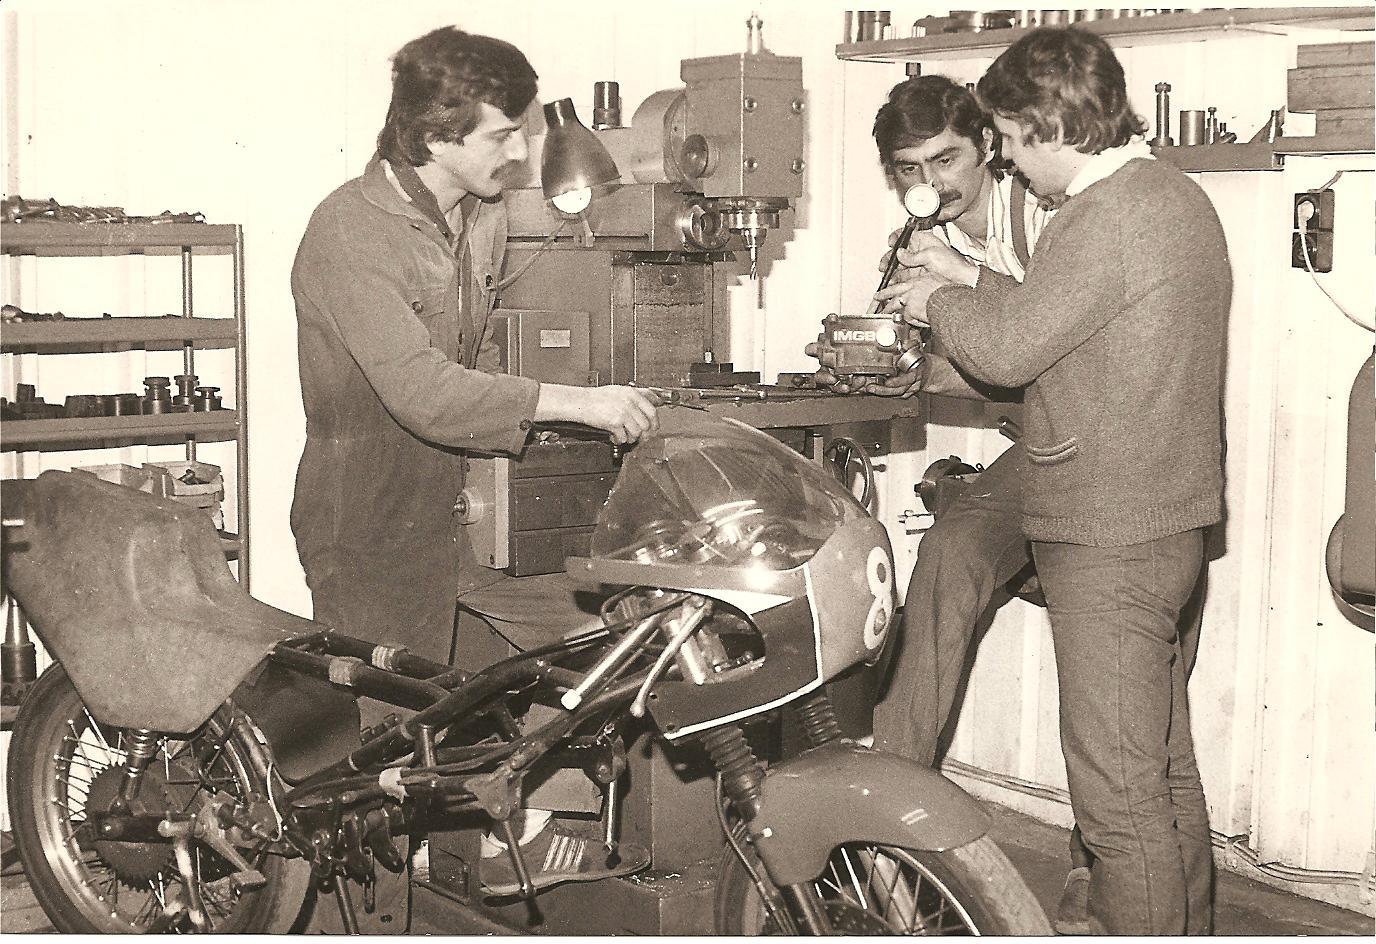 1988 - Workshop IMGB Team - Bucharest